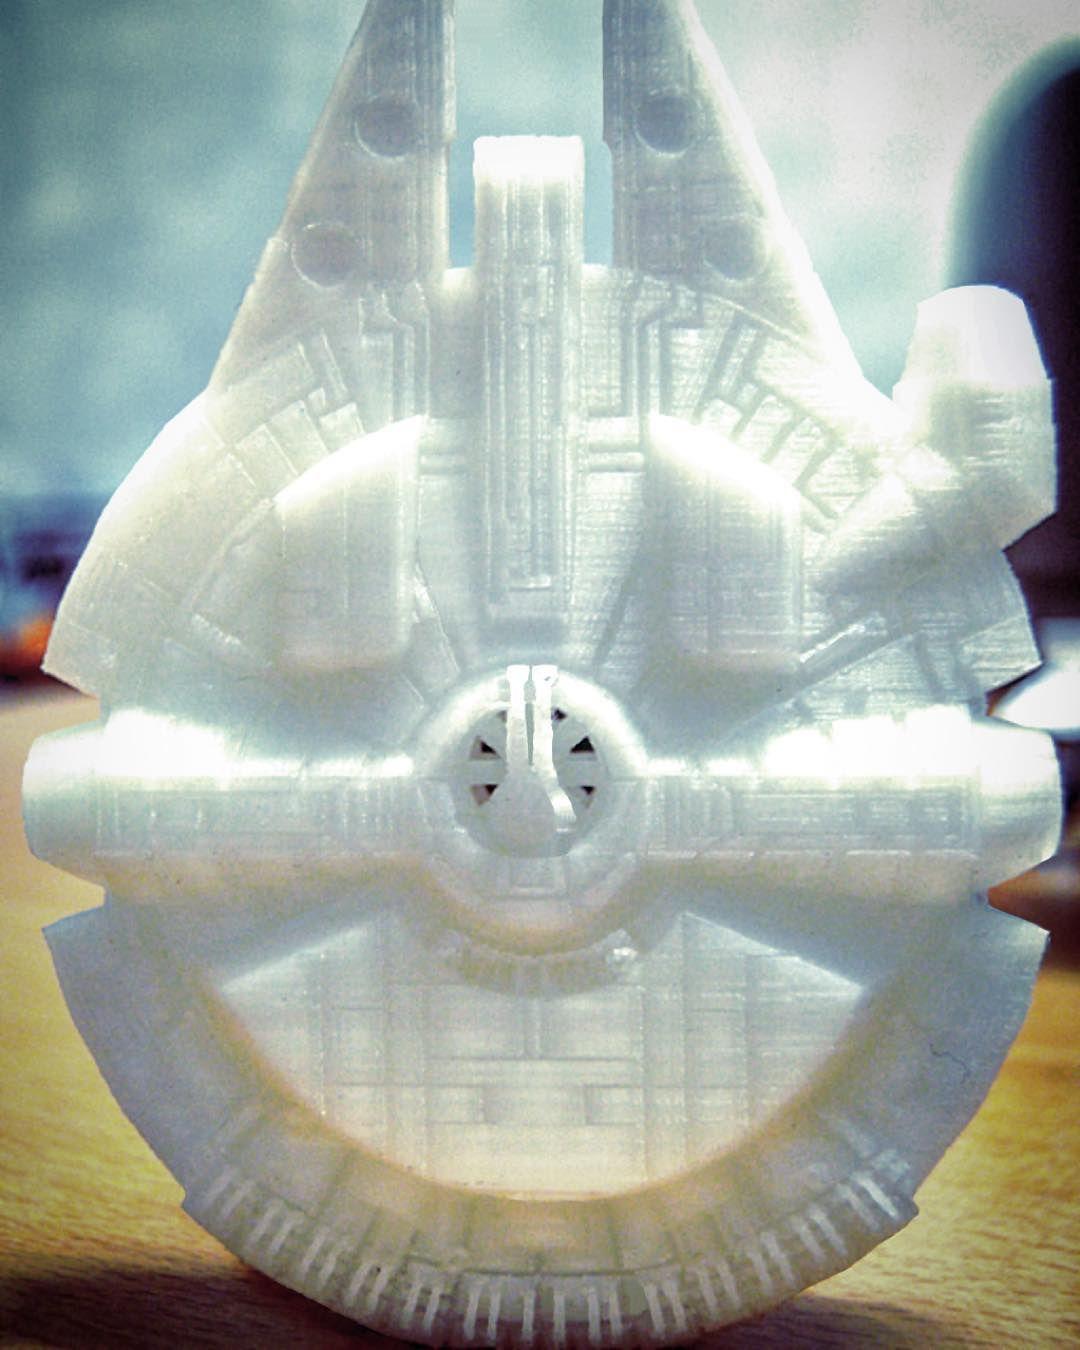 "Millennium Falcon realizzato con stampante 3D ""Allinone"" Foto in macro  #millenniumfalcon #starwars #guerrestellari #3dprinter #3dprinted #3d #3dprinting #stampaletueidee #stampa #stampa3d #stampa3dreggioemilia #stampante3d #stampante #allinone #3dline #macro #foto #fotomacro #insta3d #followme #reggioemilia #makers #makerspace #maker #nerd by 3dline_stampanti3d"